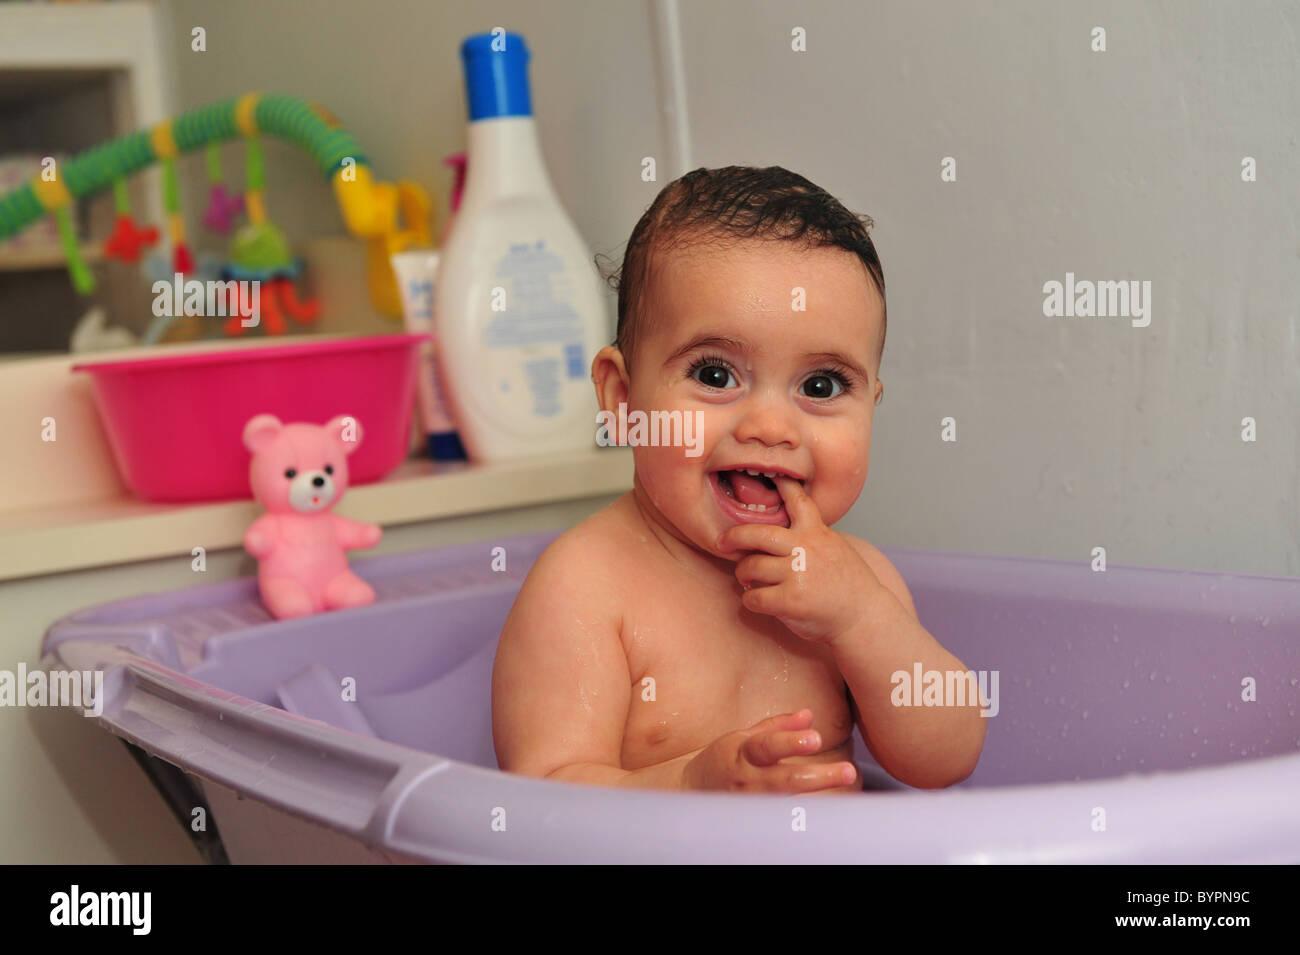 Cute baby bath in a purple bathtub Stock Photo, Royalty Free Image ...